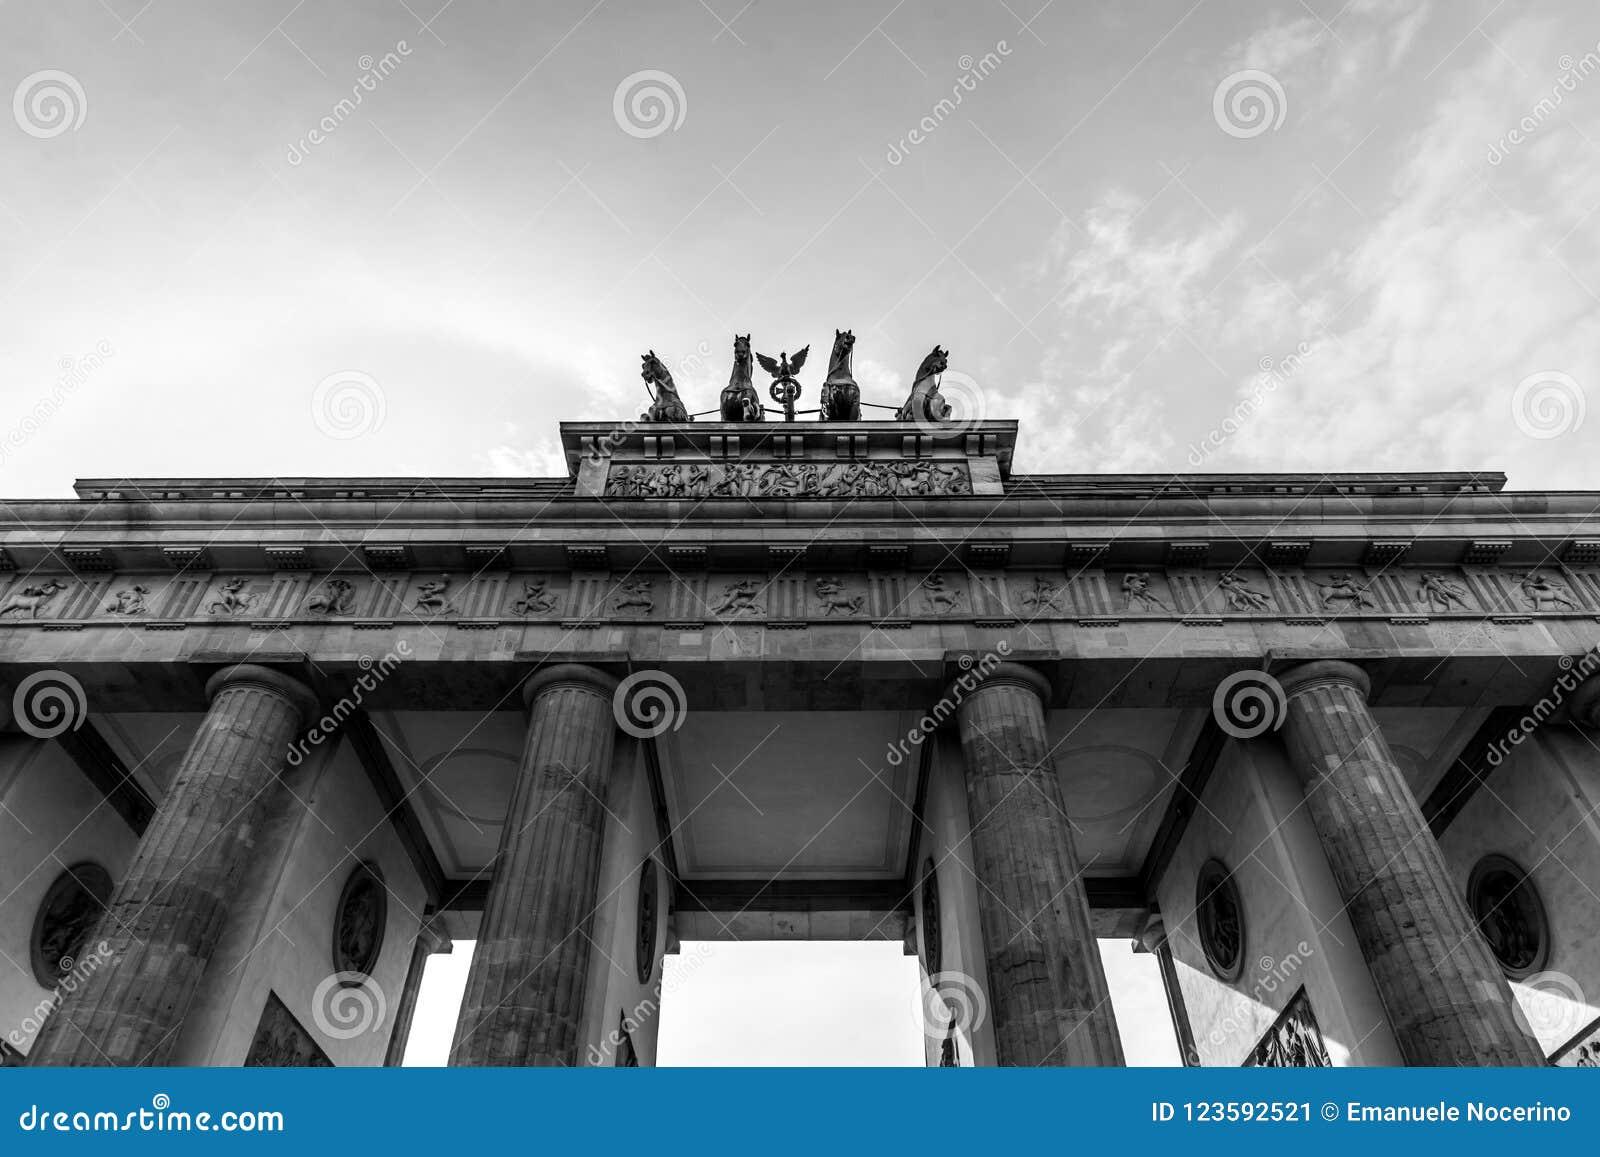 Black and white picture of the Brandenburg Gate, Berlin; Germany. Detail The Brandenburg Gate quadriga. Pariser Platz.